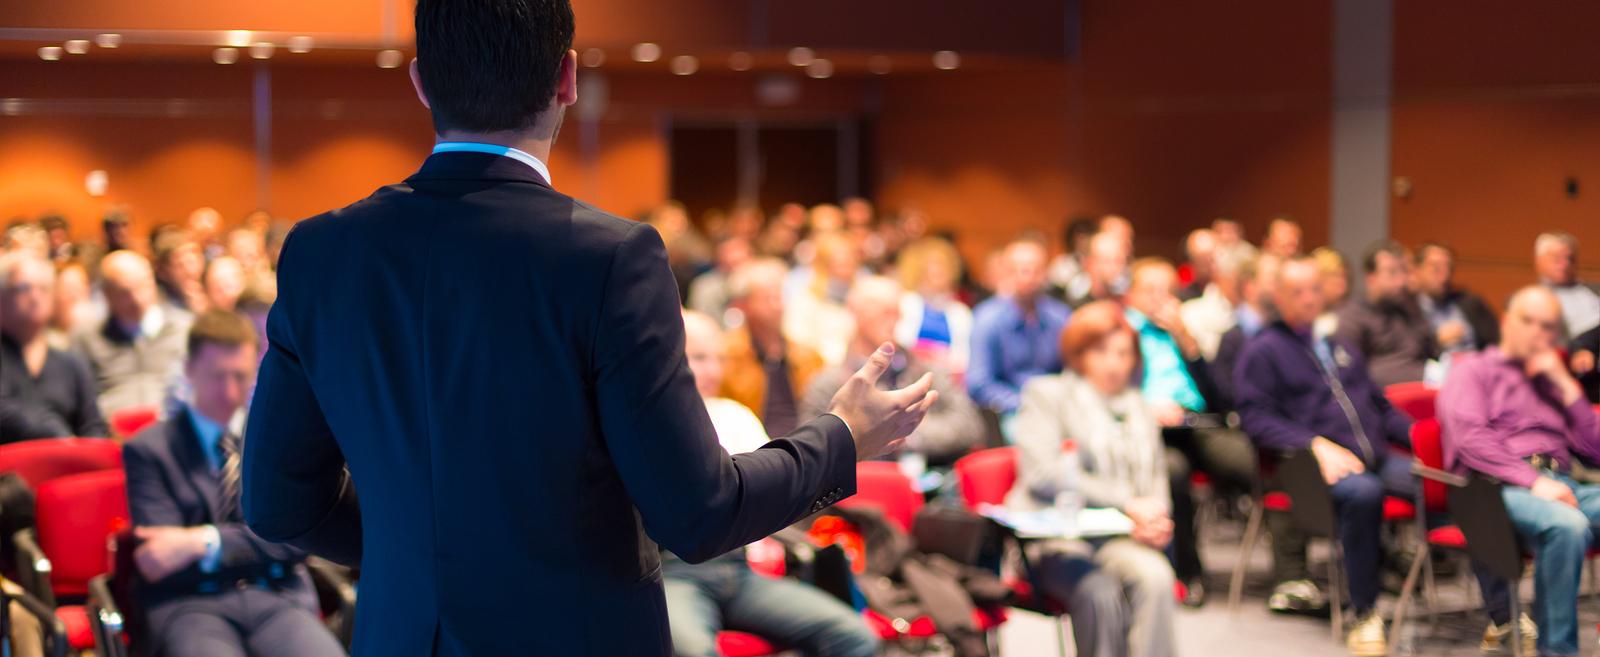 bigstock-Speaker-at-Business-Conference-67409458